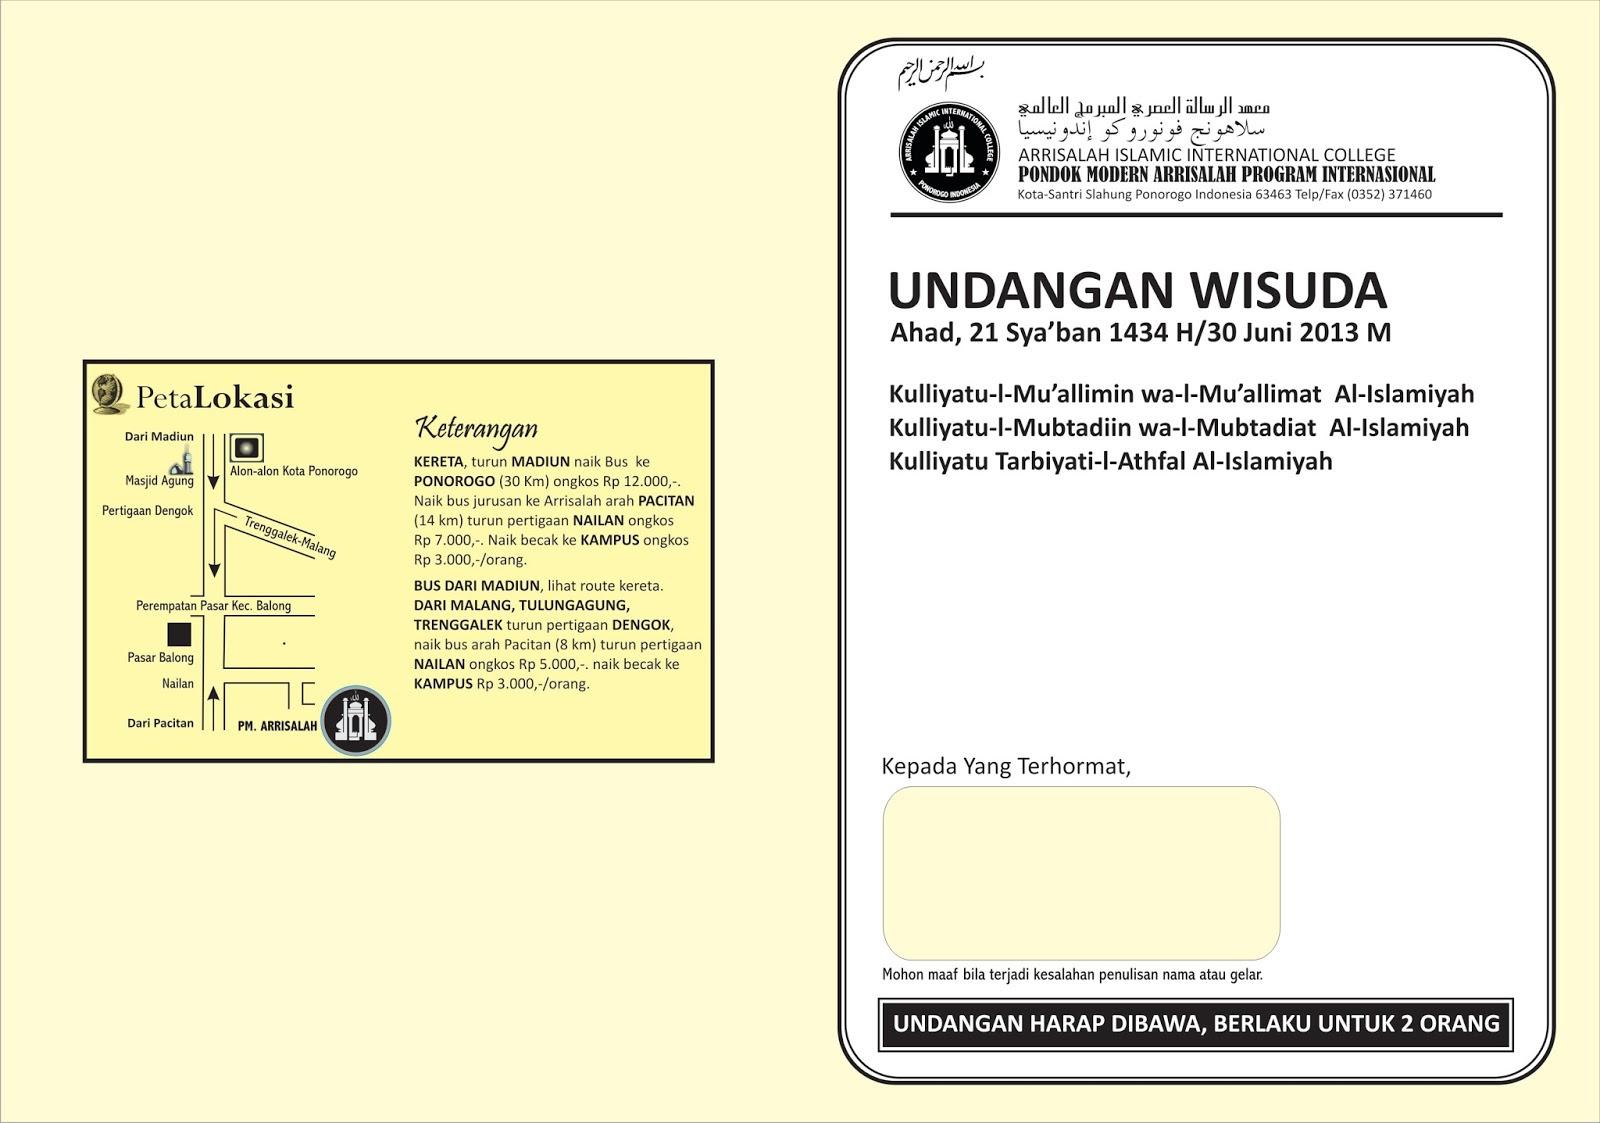 Contoh Surat Undangan Visa Ke Indonesia Contoh Ilb